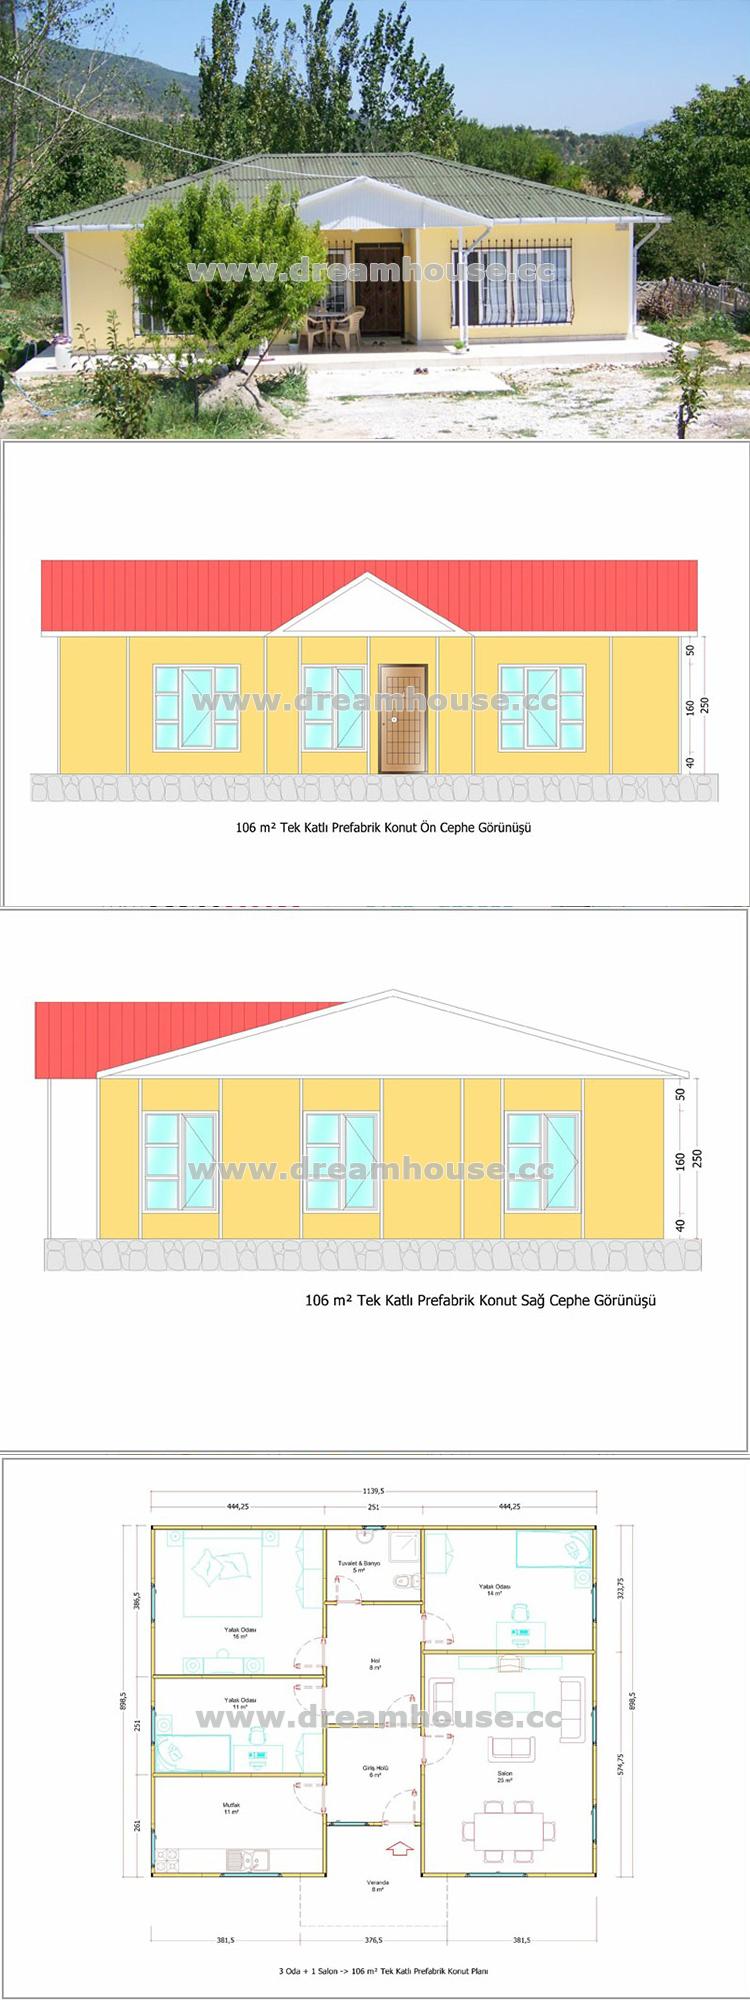 Hot 2016 New Design Prefabricated House Plans Economic